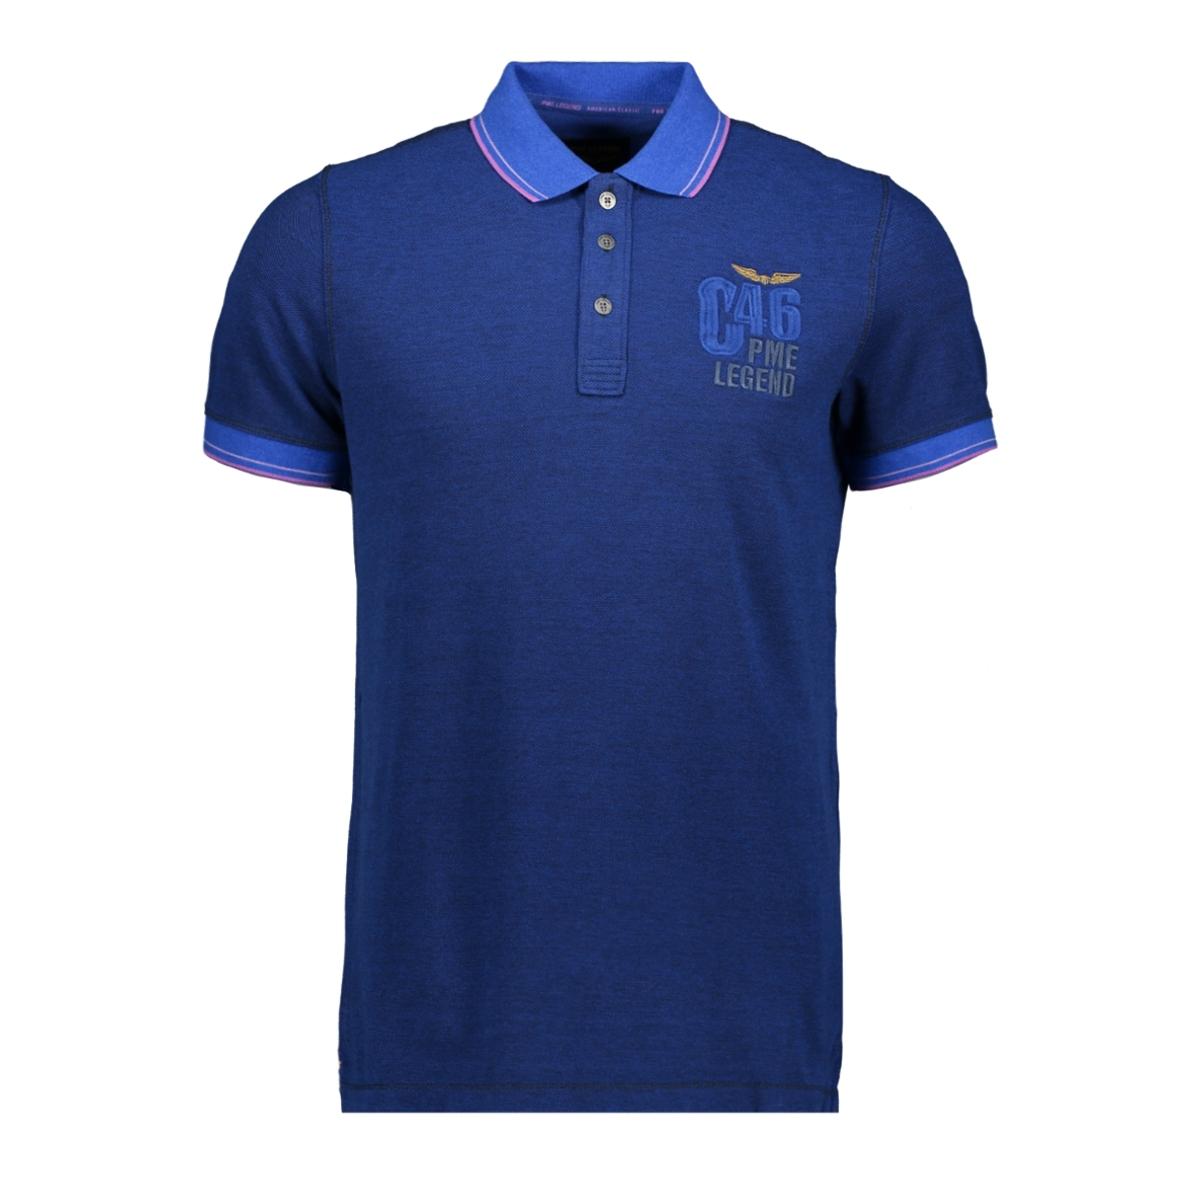 jacquard jersey polo ppss193856 pme legend polo 5089